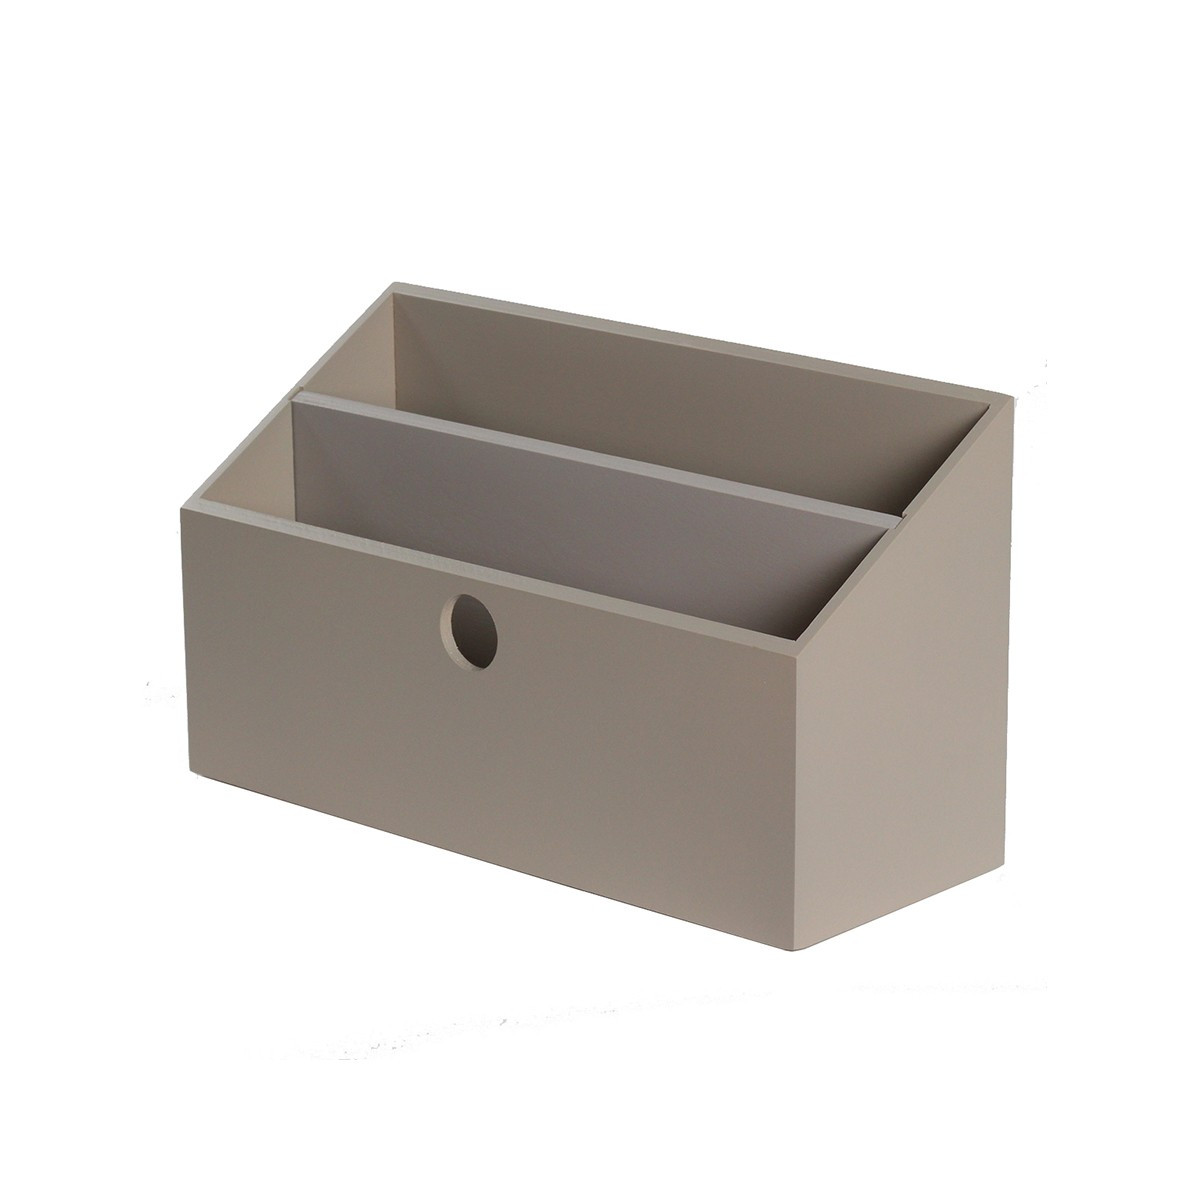 porte lettres bois gris taupe rangement courrier. Black Bedroom Furniture Sets. Home Design Ideas